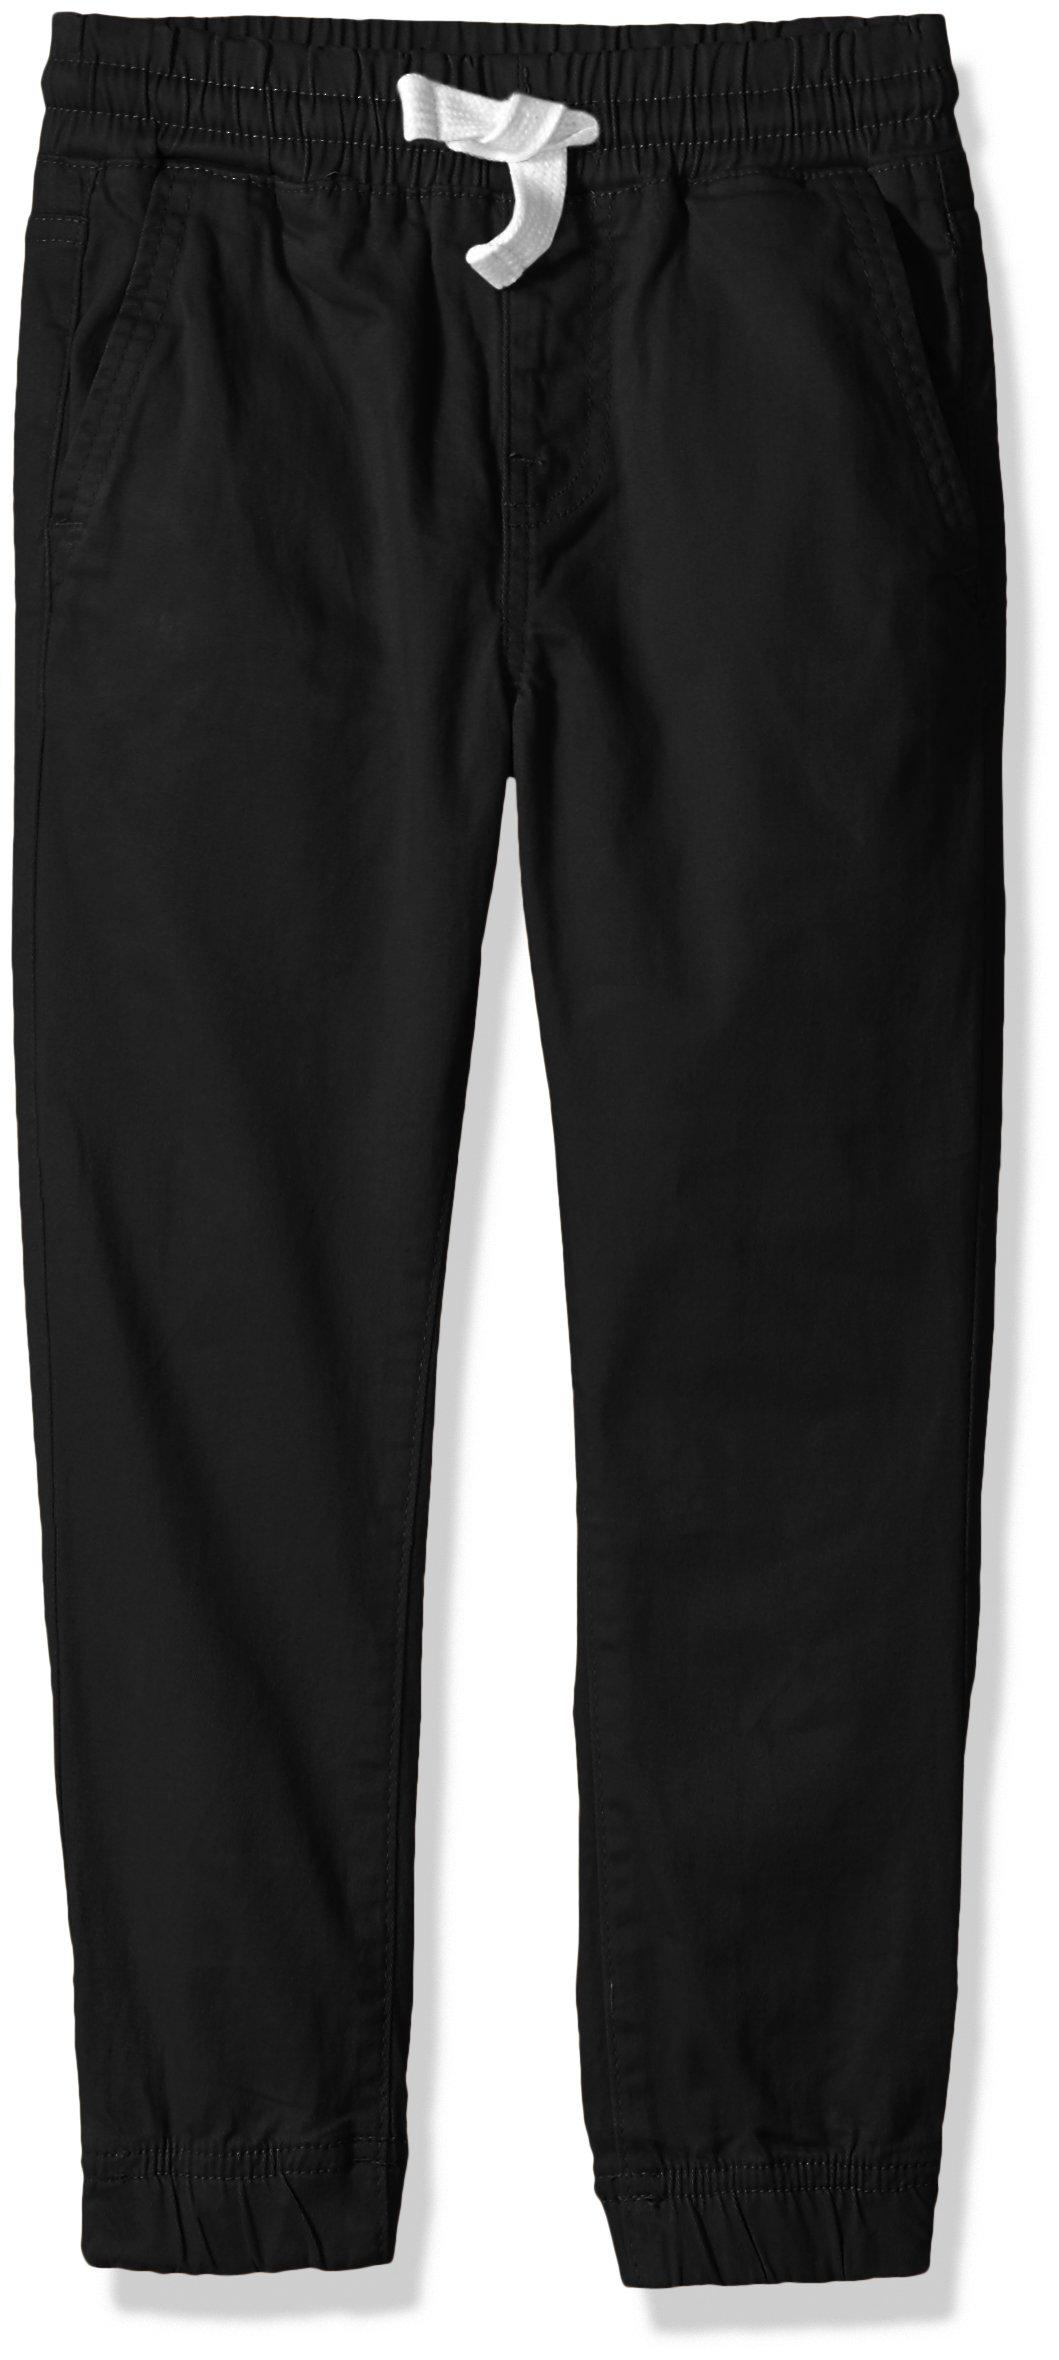 Lucky Brand Big Boys' Jogger Pant, Black, Medium (10/12)